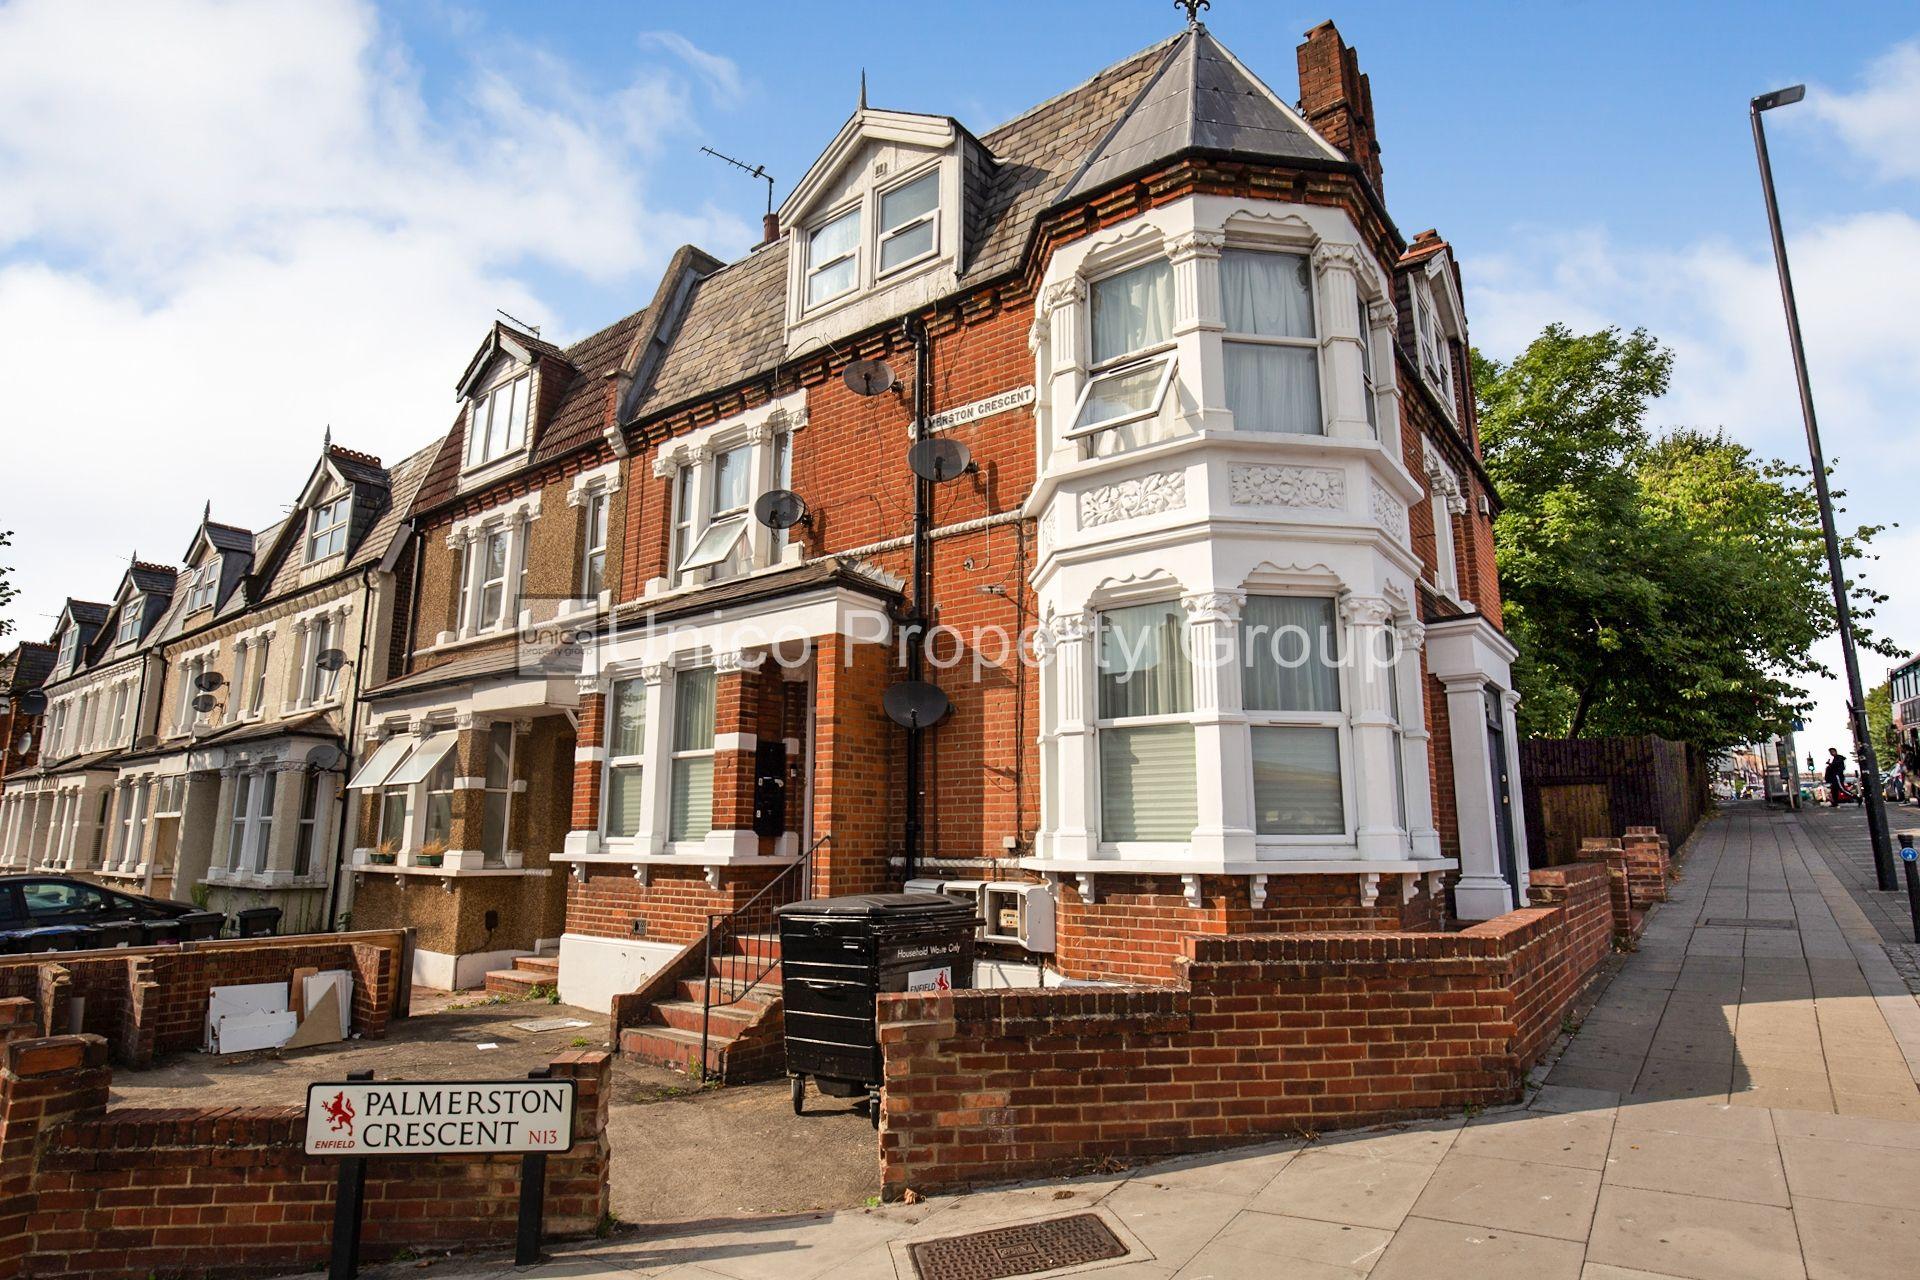 Palmerston Crescent, London